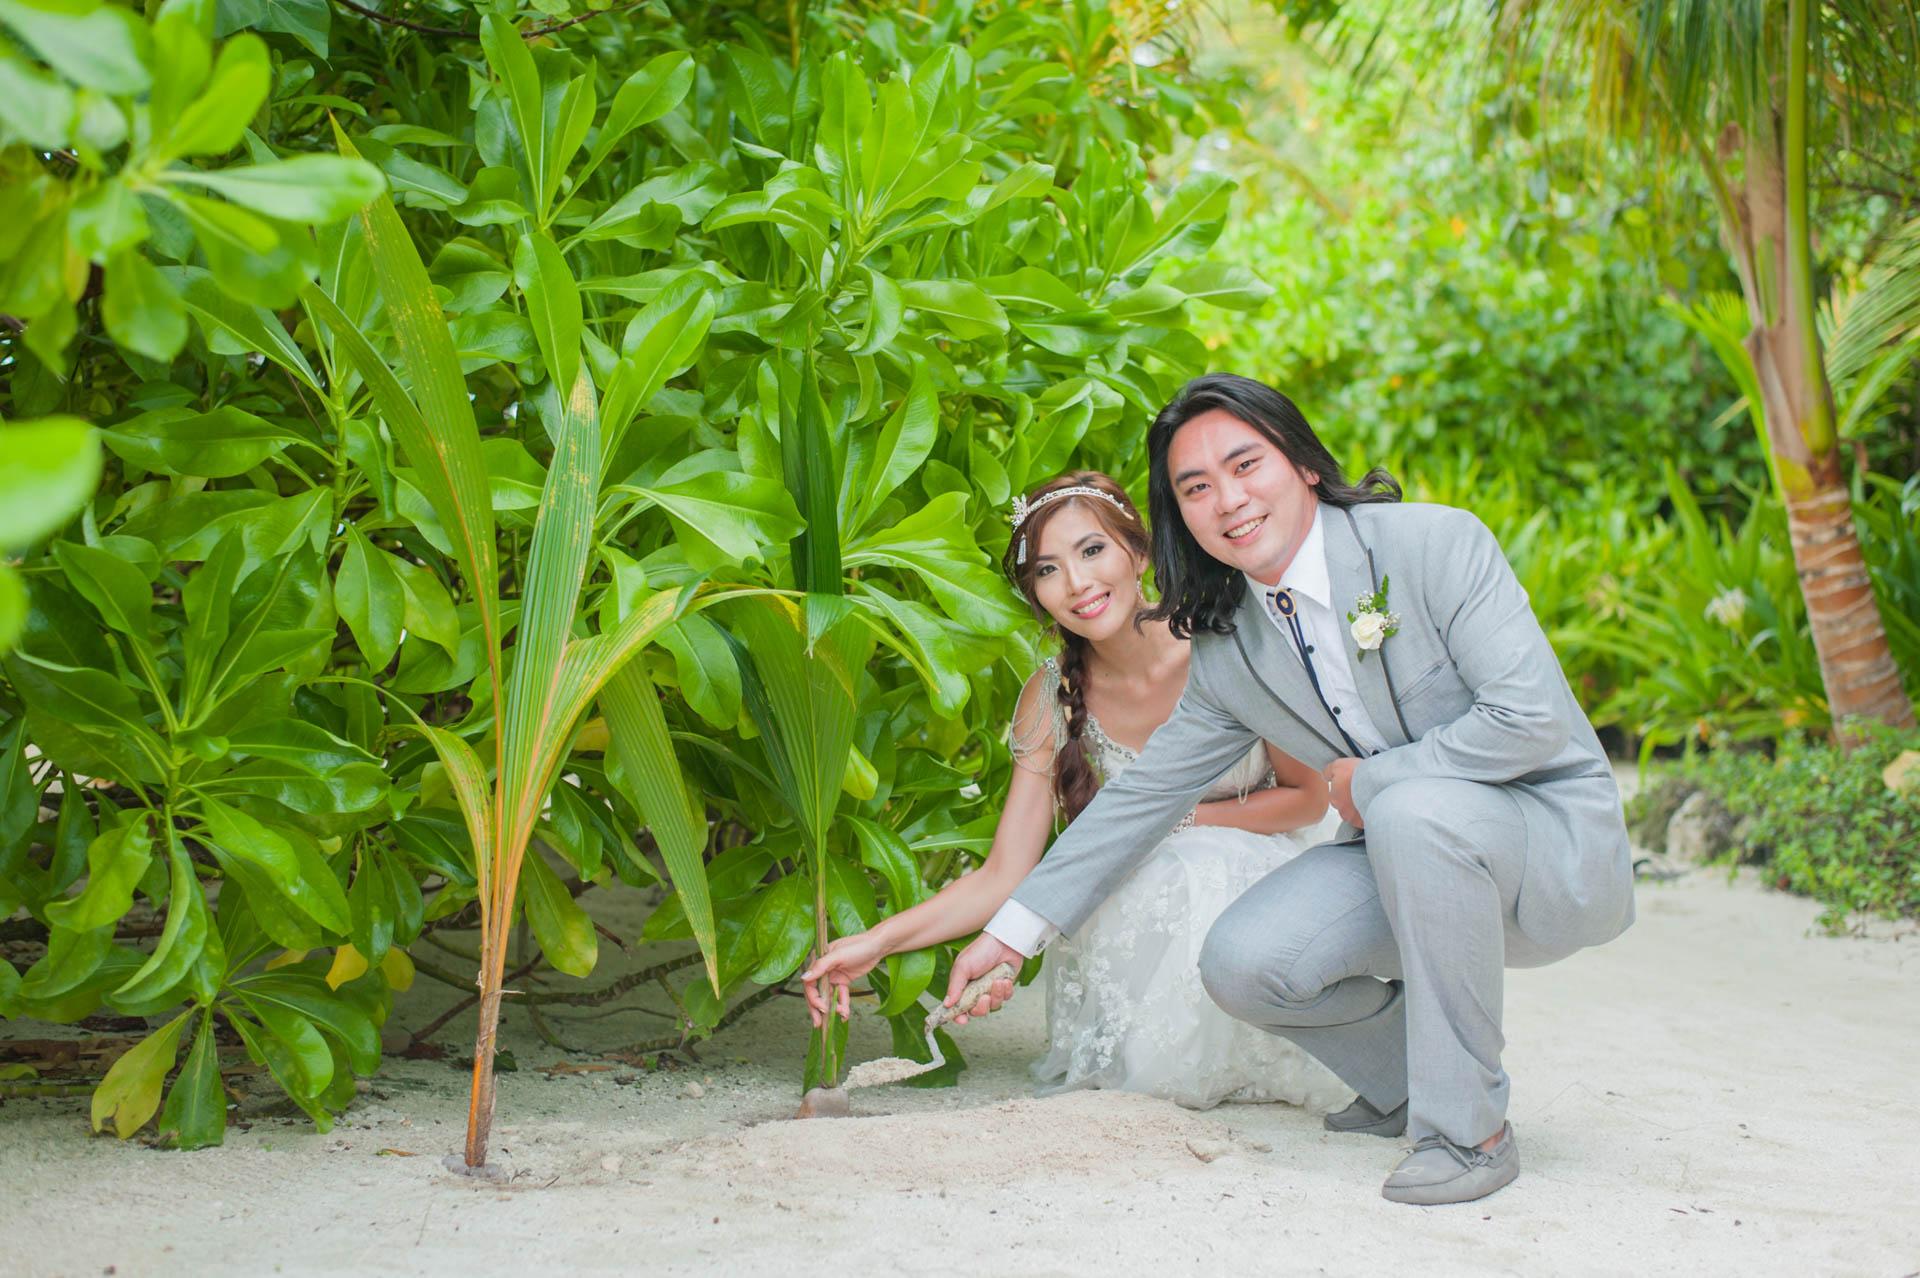 Chih Chao Yu Shan Destination Wedding at Residence Maldives 17